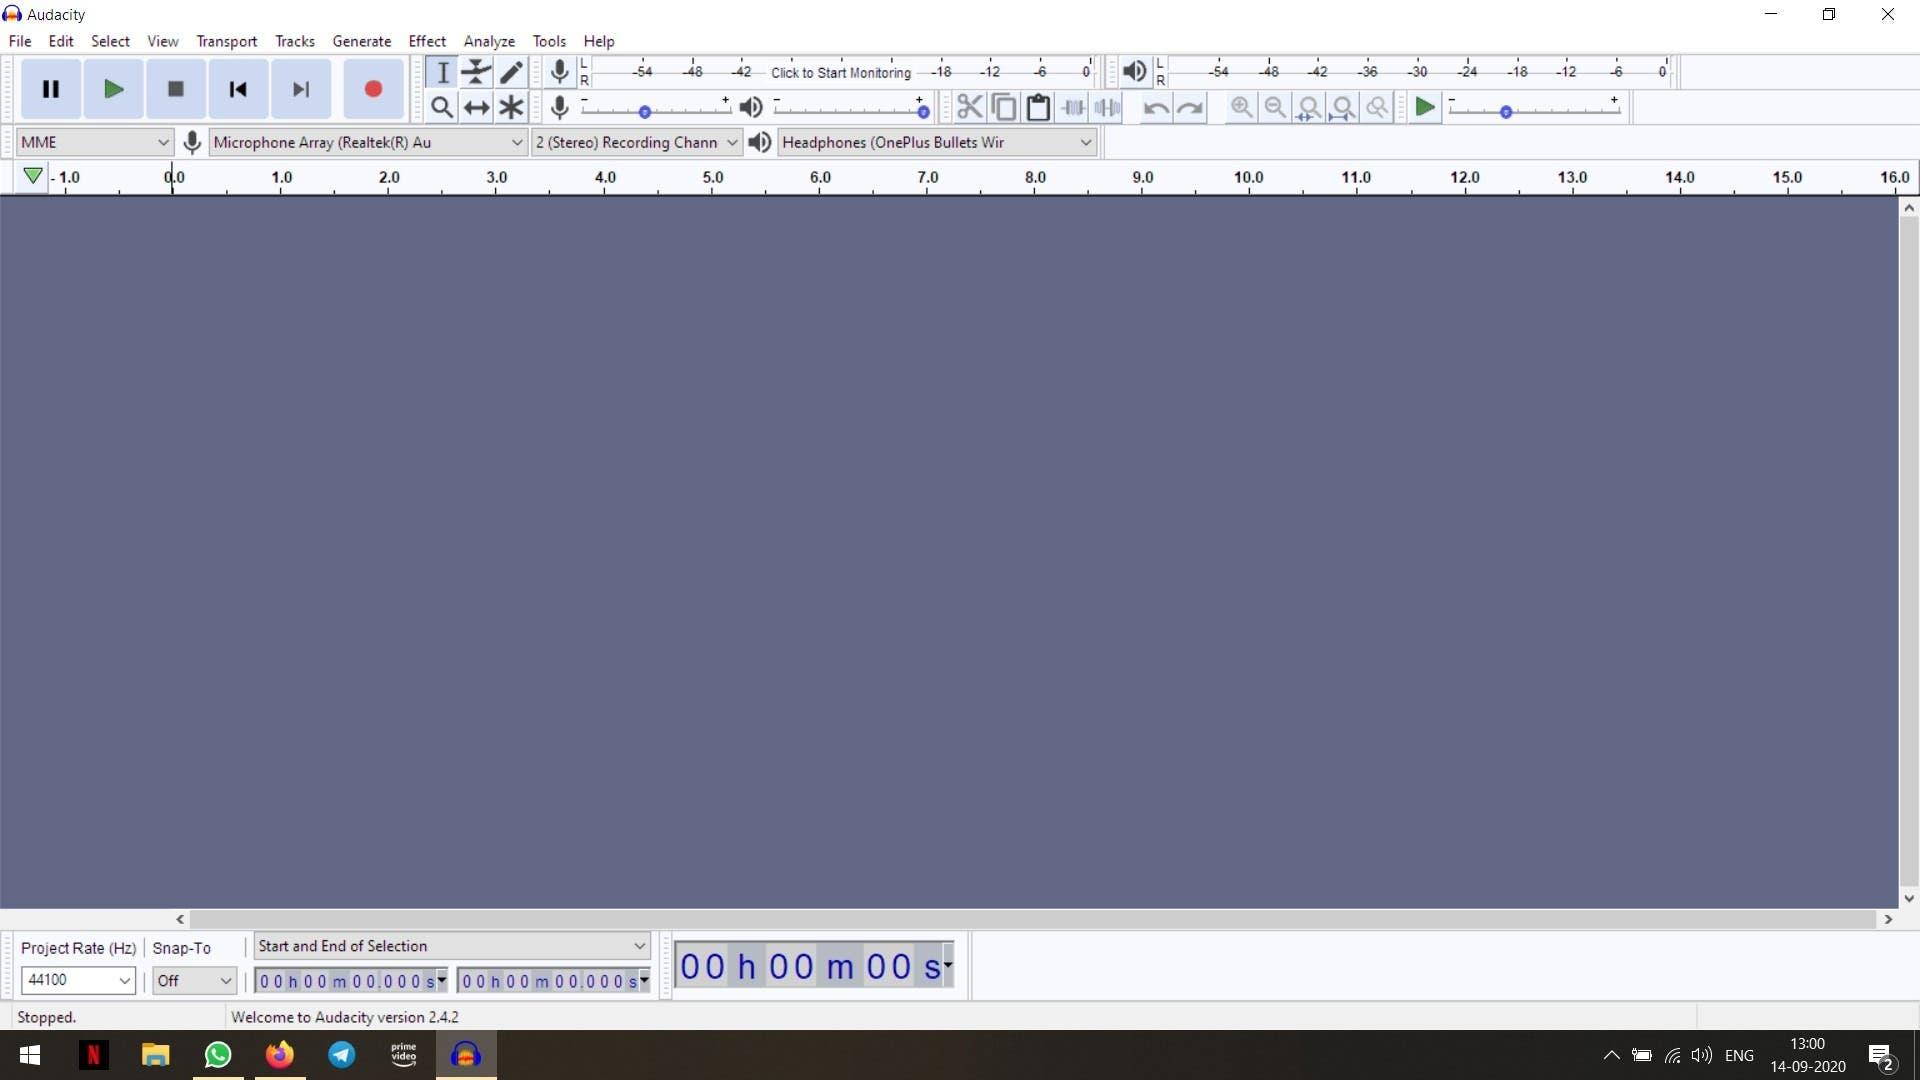 texto borroso en los programas de Windows 10